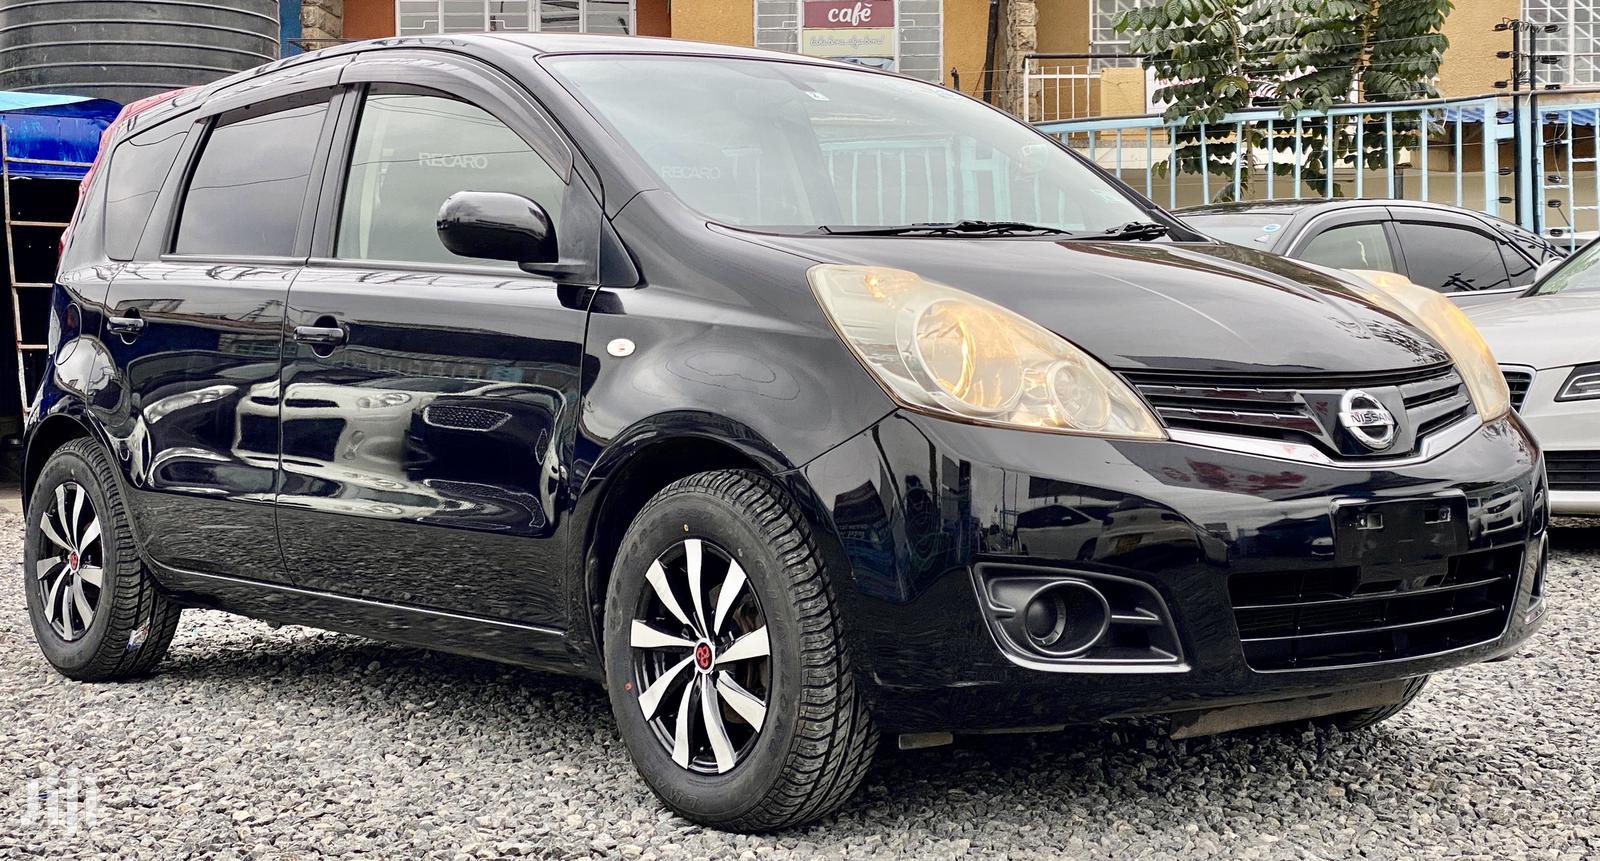 Nissan Note 2012 1.4 Black | Cars for sale in Kilimani, Nairobi, Kenya